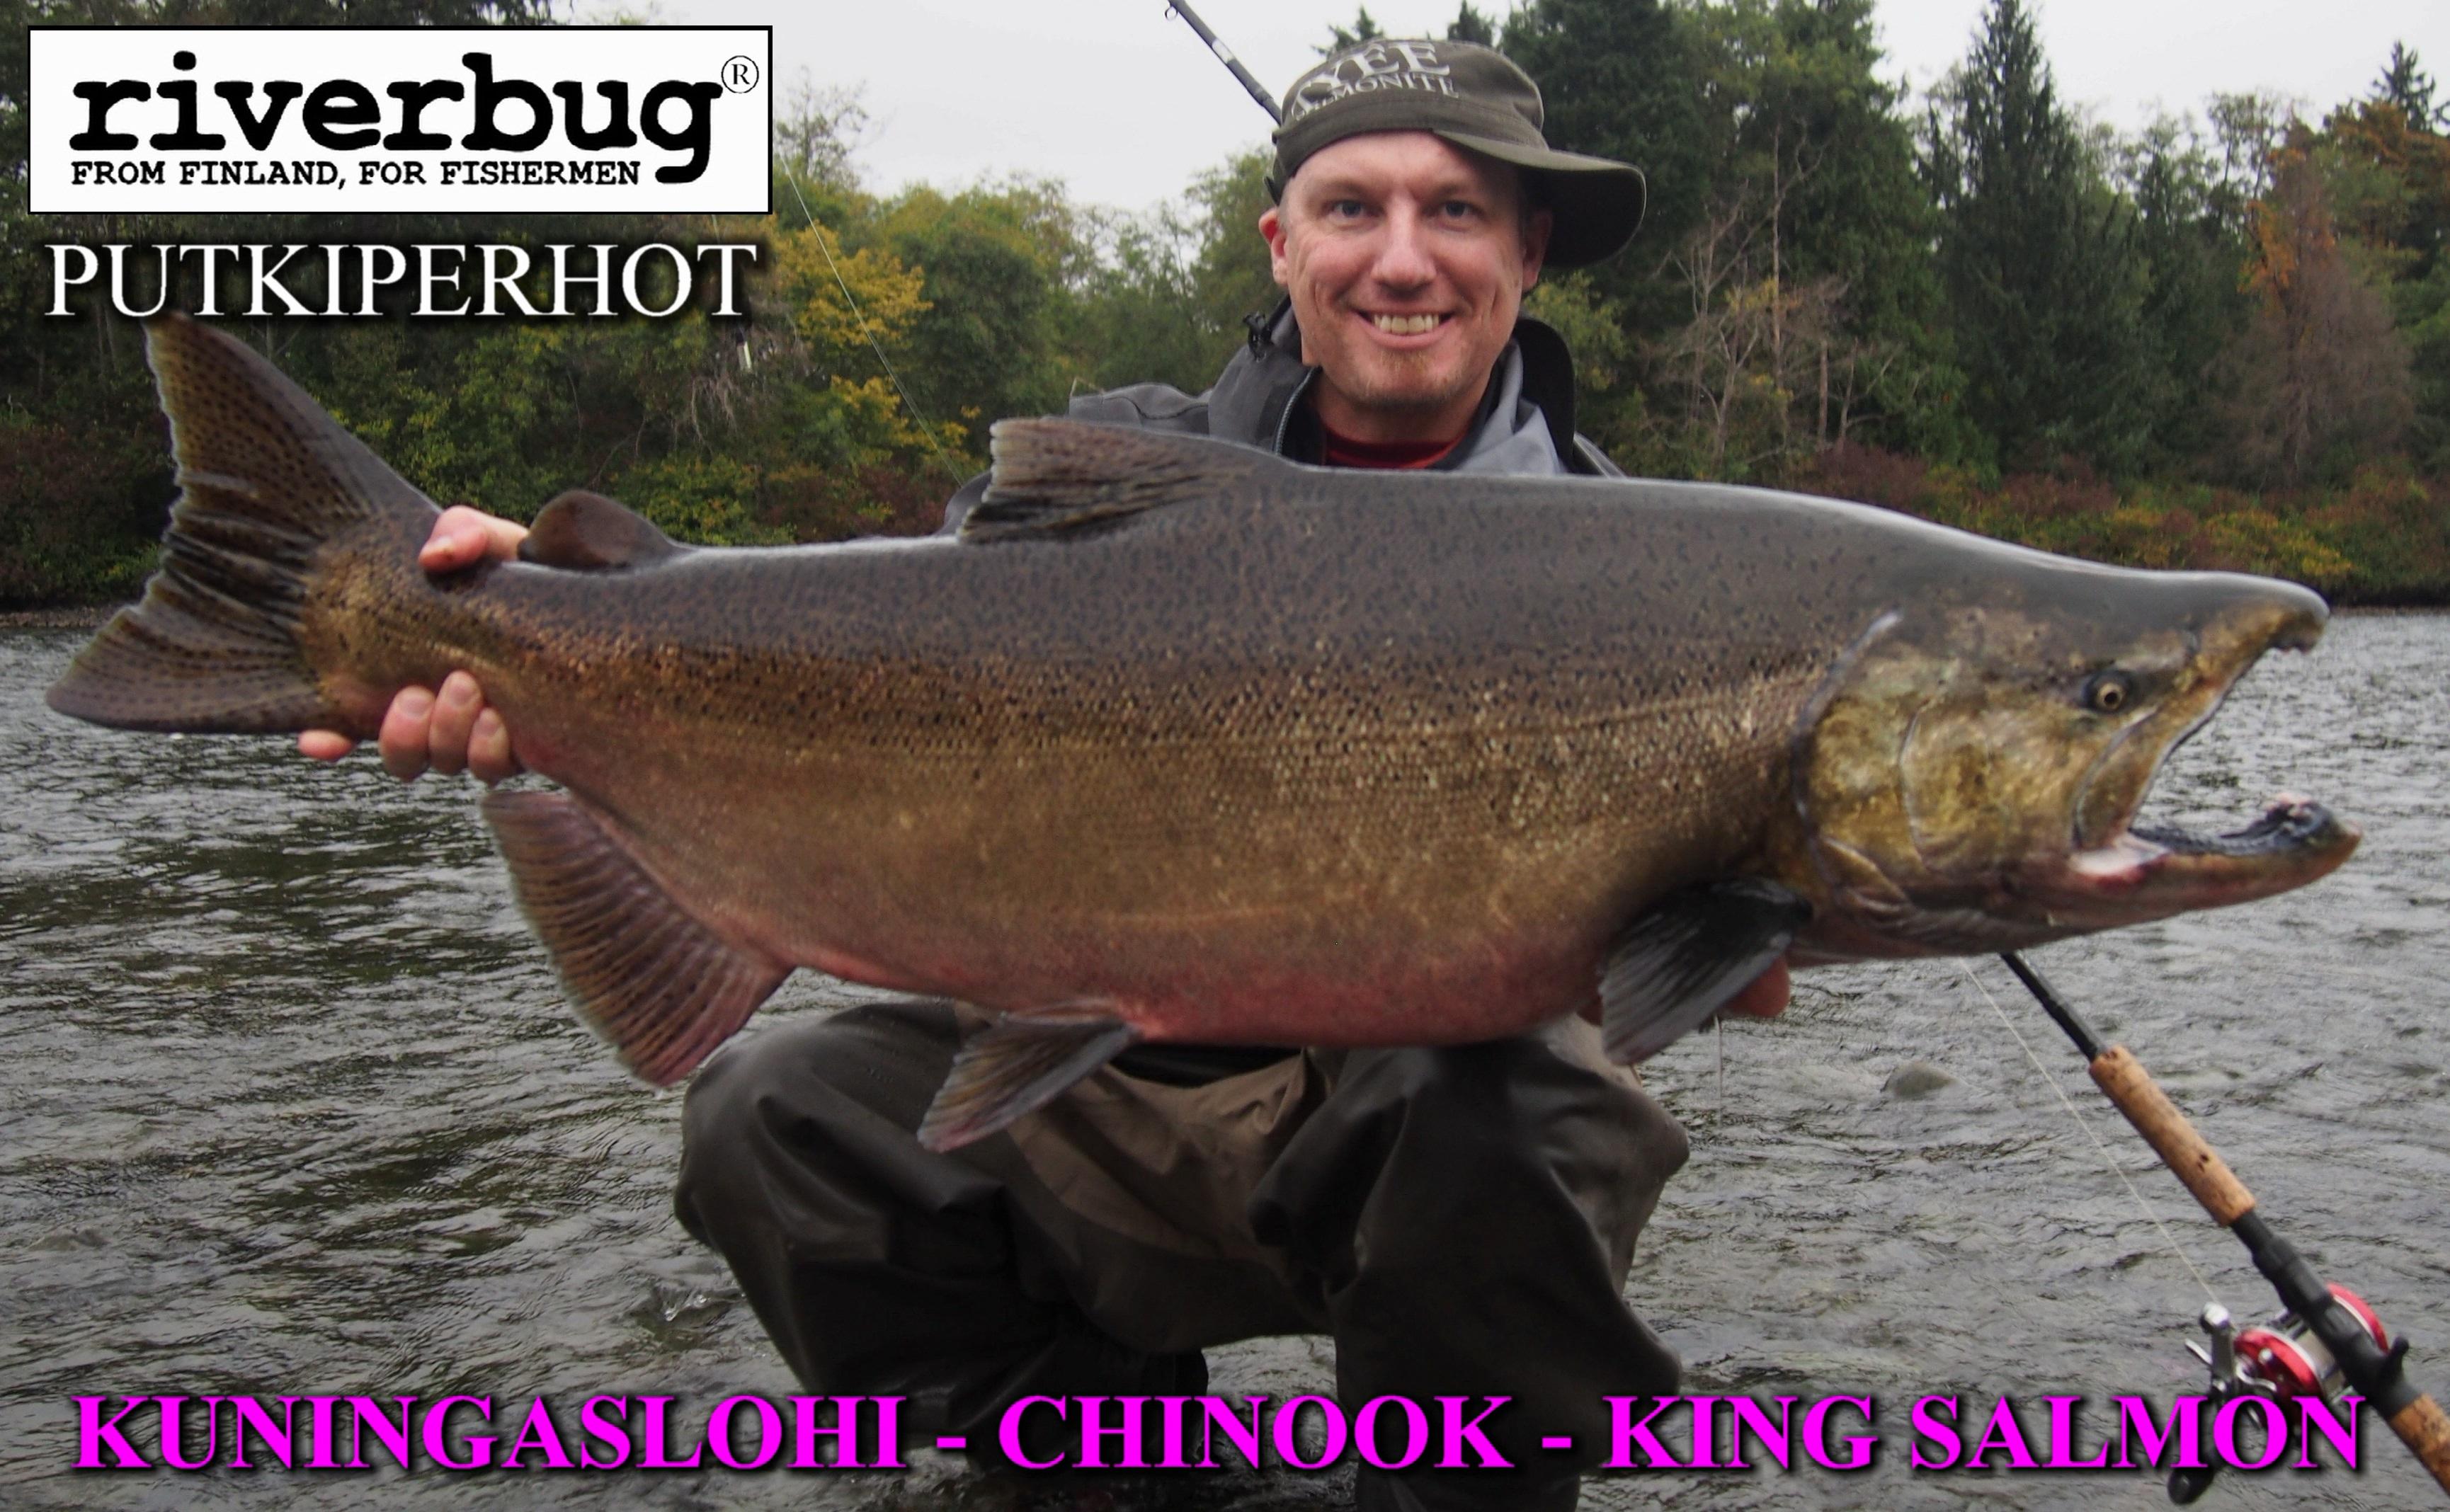 Spinfly King Salmon ( KUNINGASLOHI ) with RiverBug singlehook fly. #kingsalmon #kuningaslohi #lohi #canada #putkiperhot #streamer #kalastus #fishing #kala #perhokauppa #riverbug